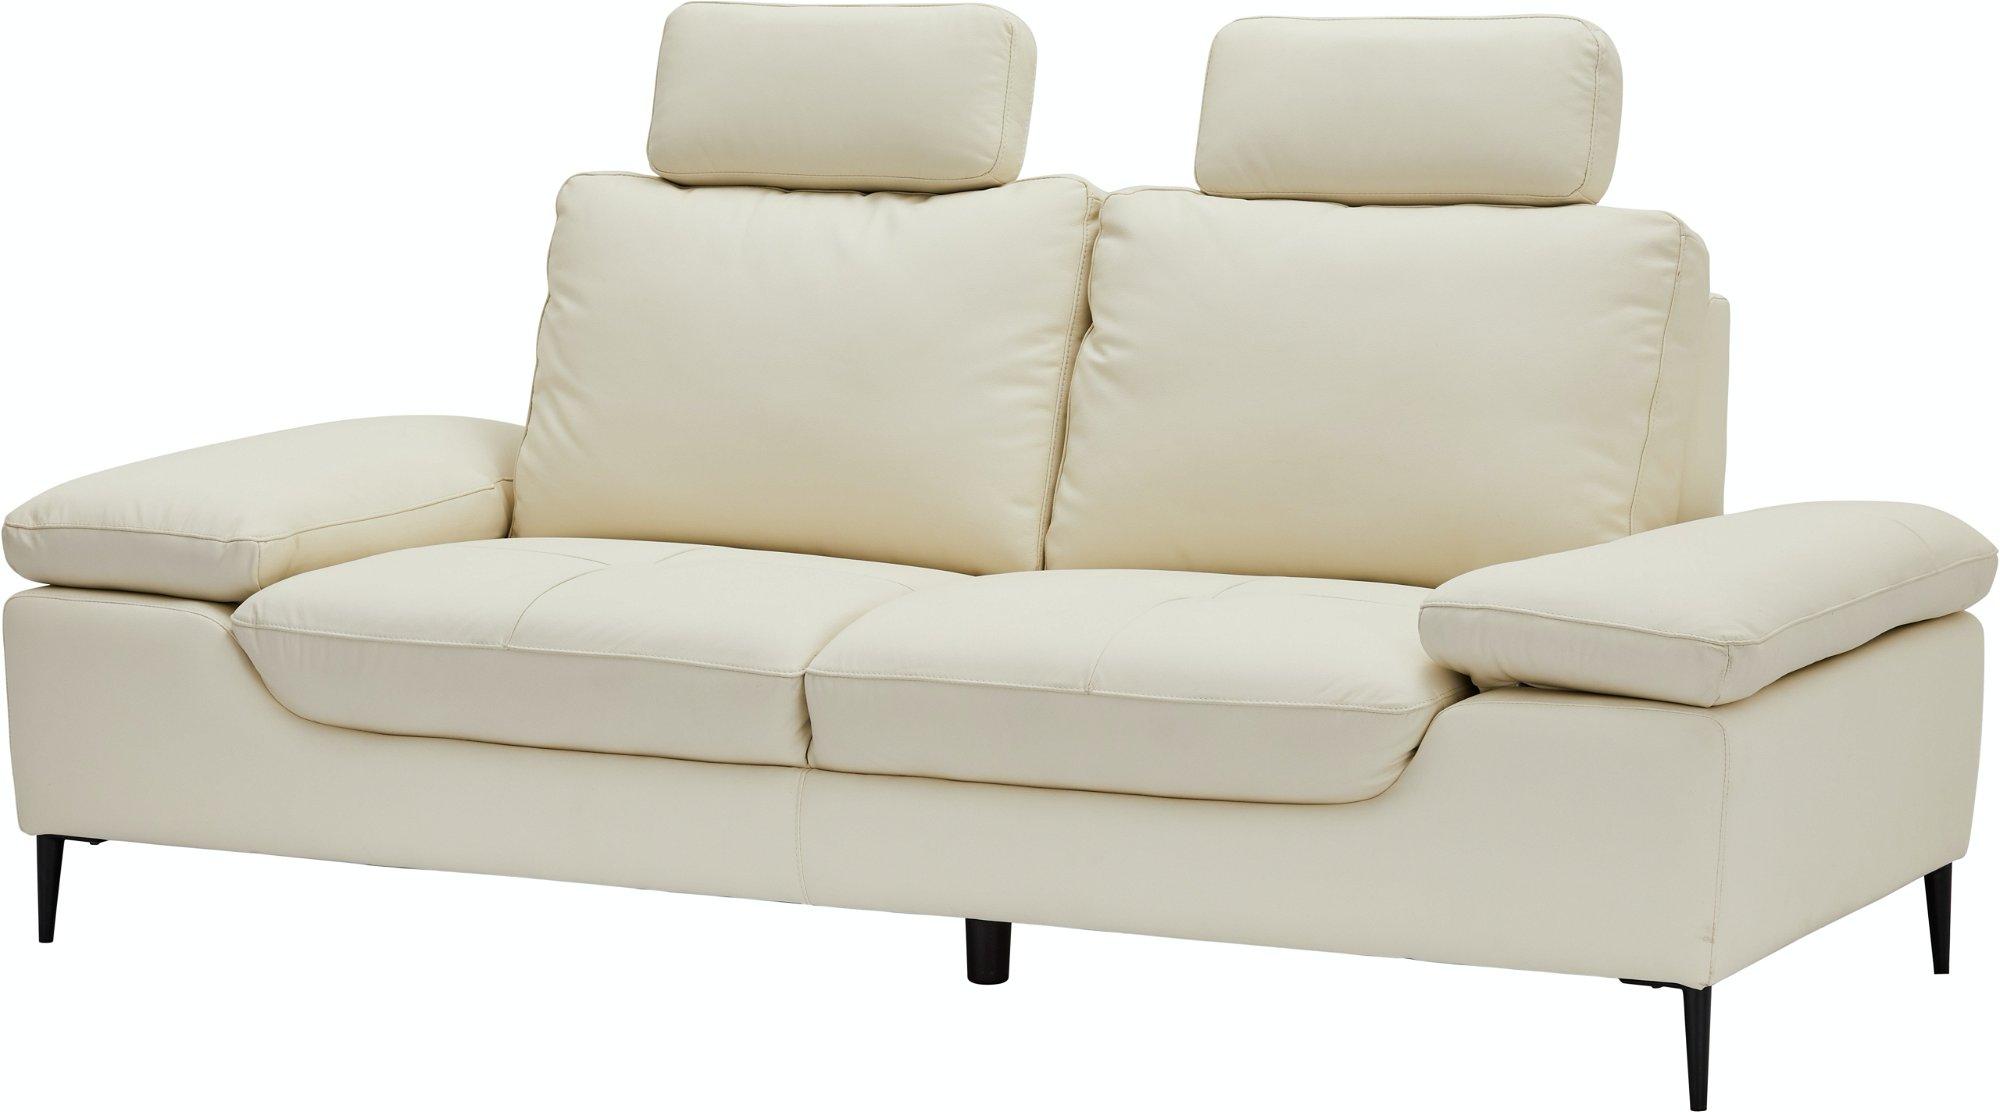 St. Annes, 2-personers sofa, Ægte læder by Raymond & Hallmark (H: 105 cm. B: 217 cm. L: 92 cm., Fløde)